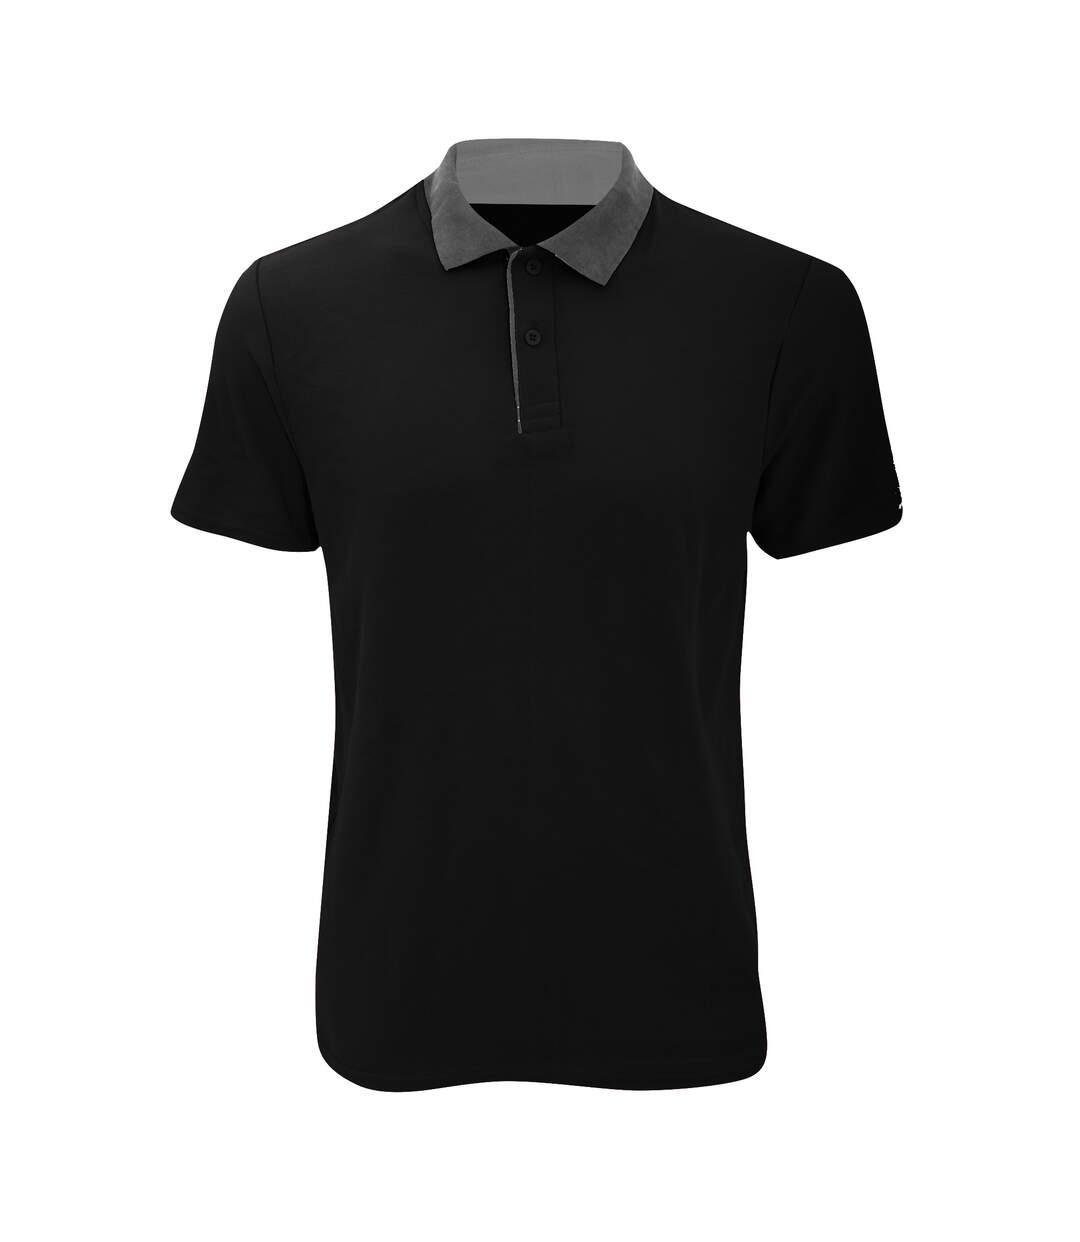 Anvil Mens Fashion Double Pique Plain Polo Shirt (210 GSM) (White) - UTRW2535